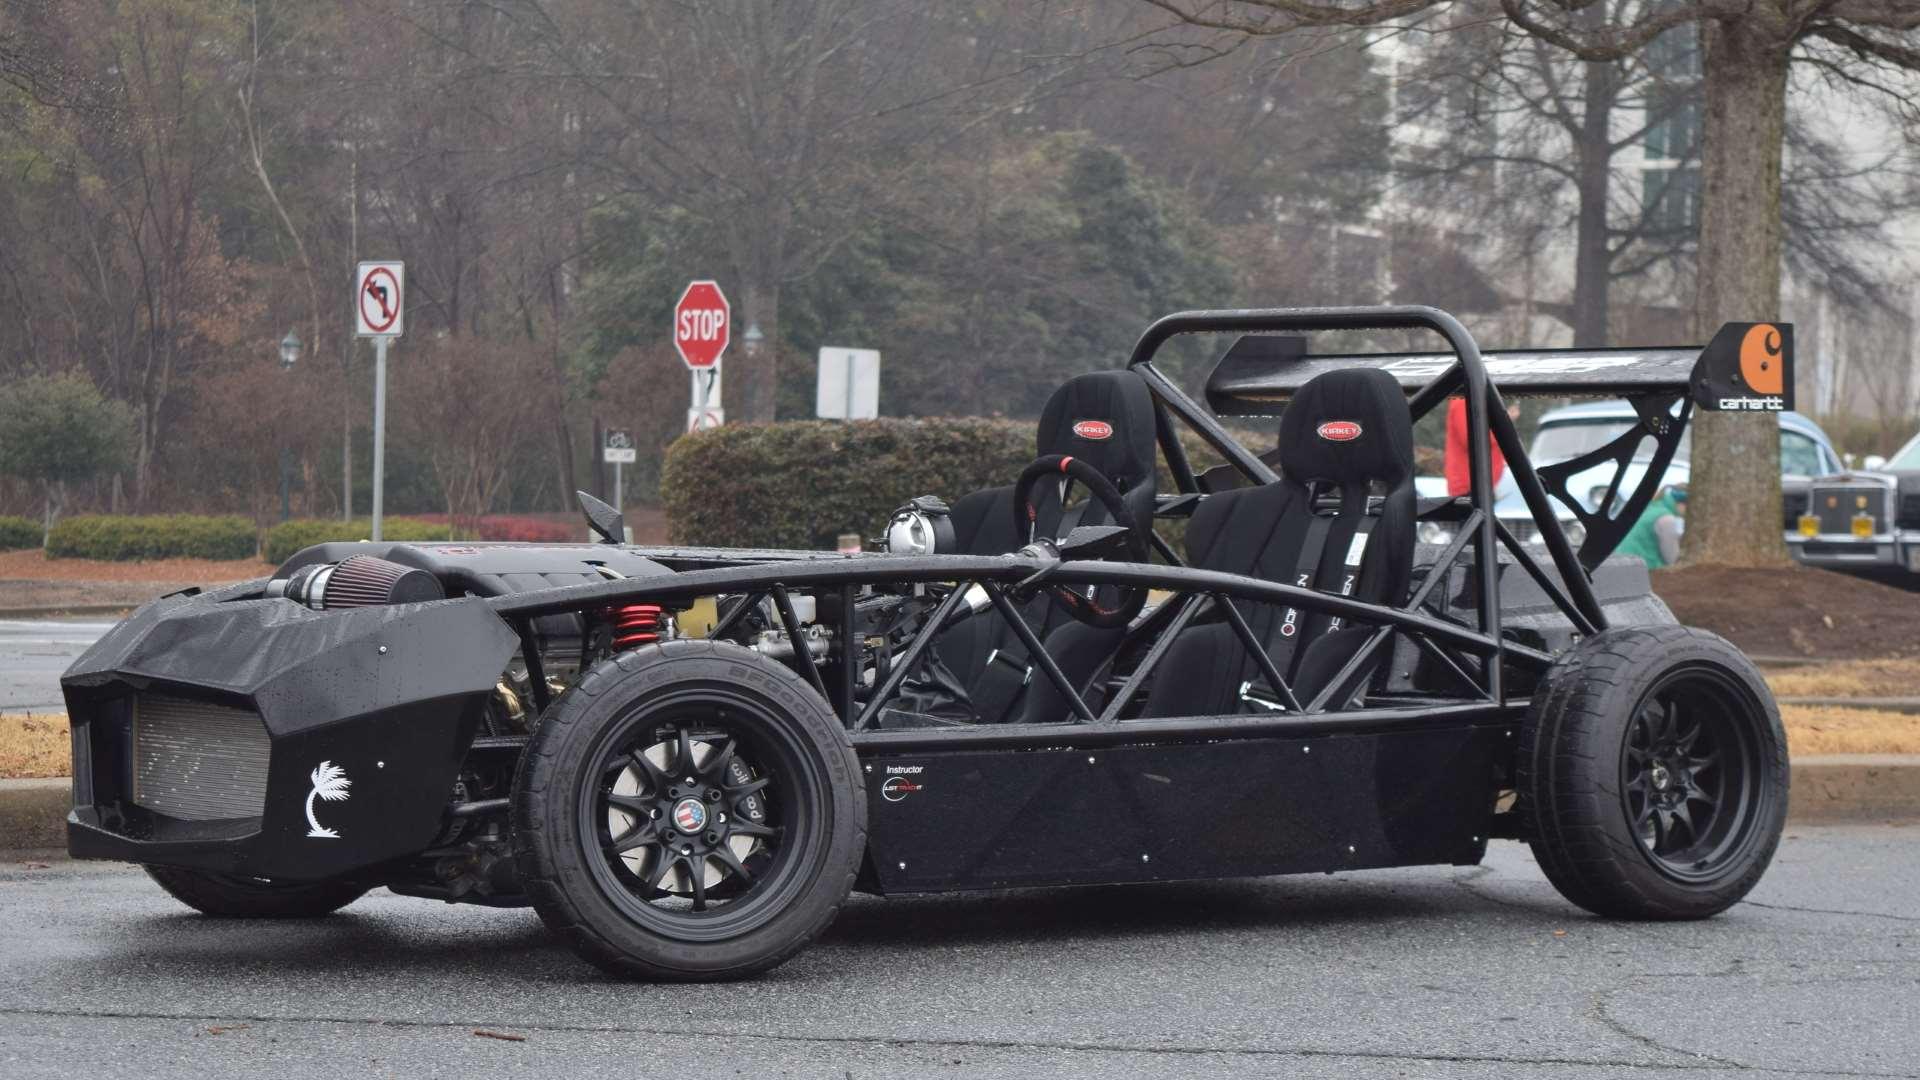 Kit Car By Exomotive Exocet